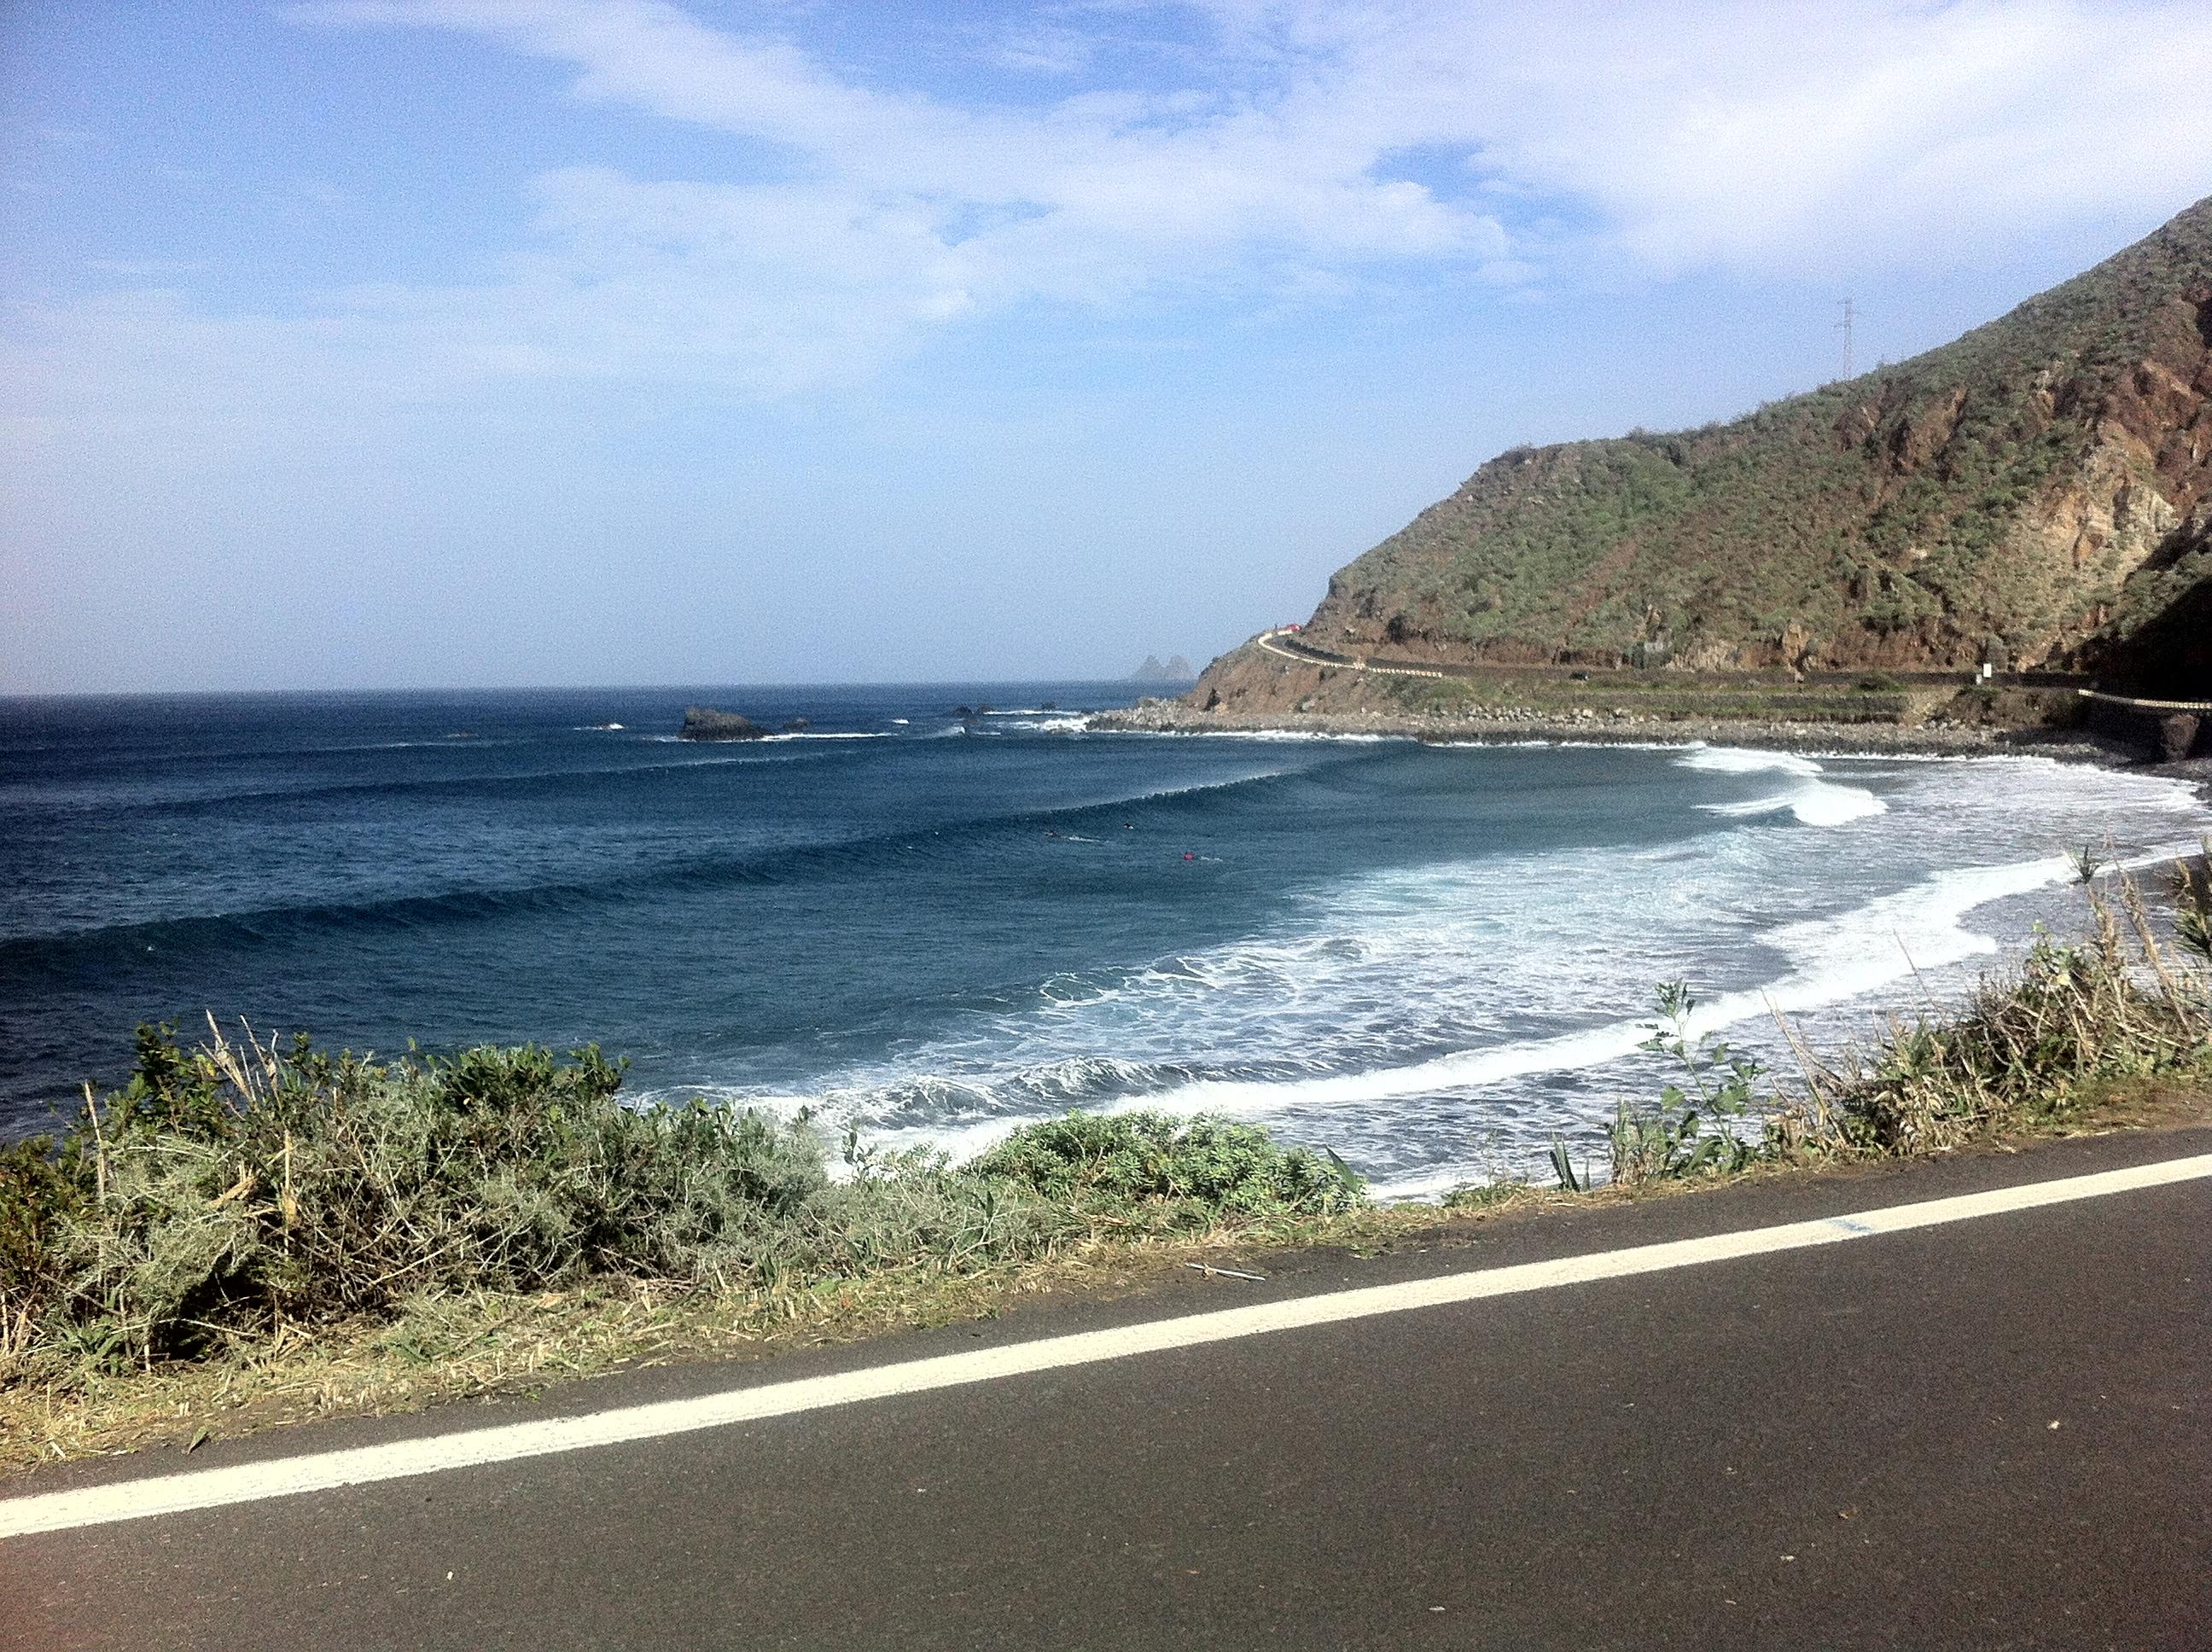 Scuola Surf Canarie - Tenerife